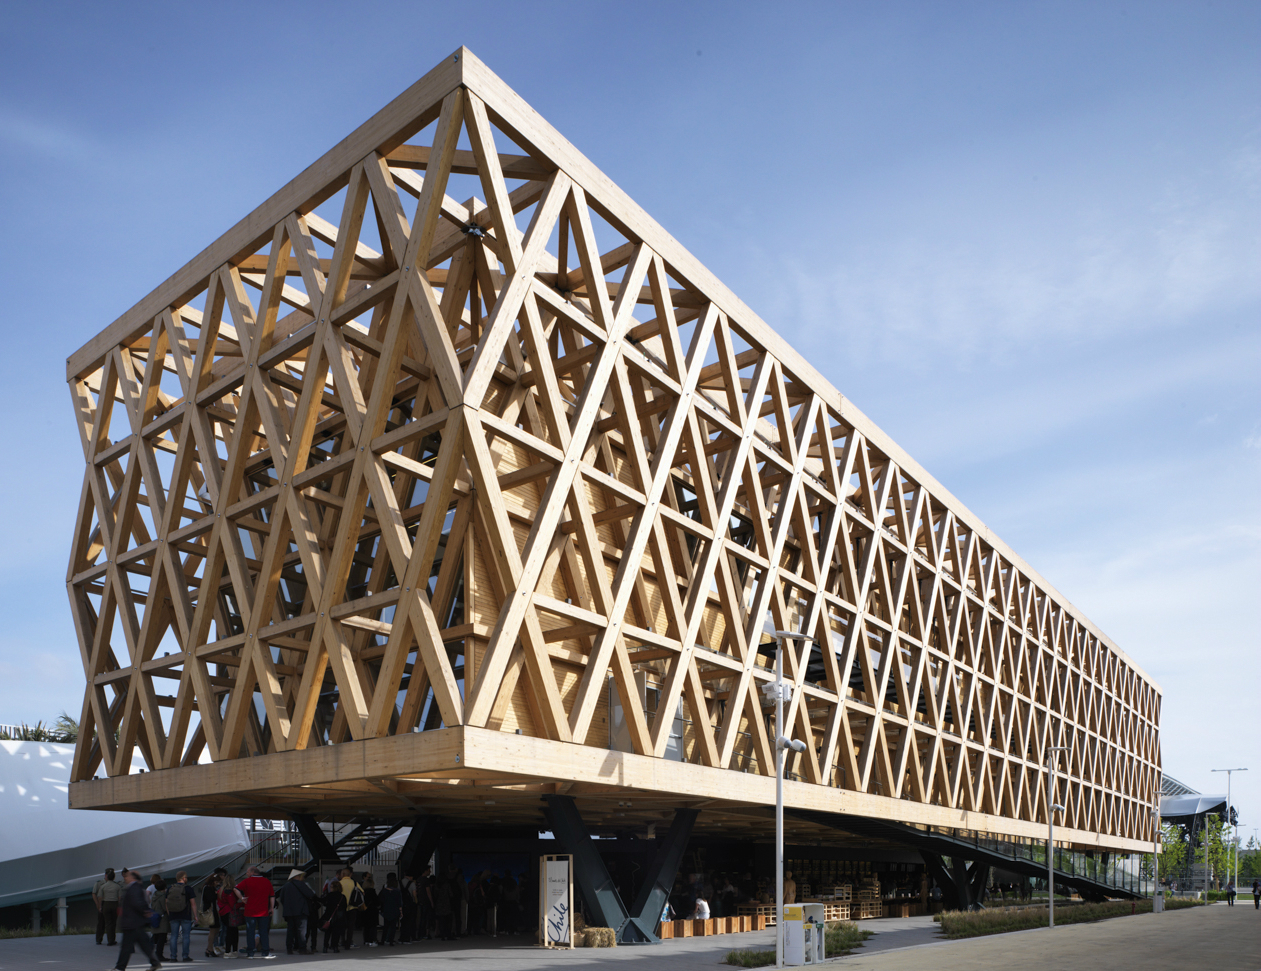 Pabell n de chile en la expo mil n 2015 se convertir en for Articulos de arquitectura 2015